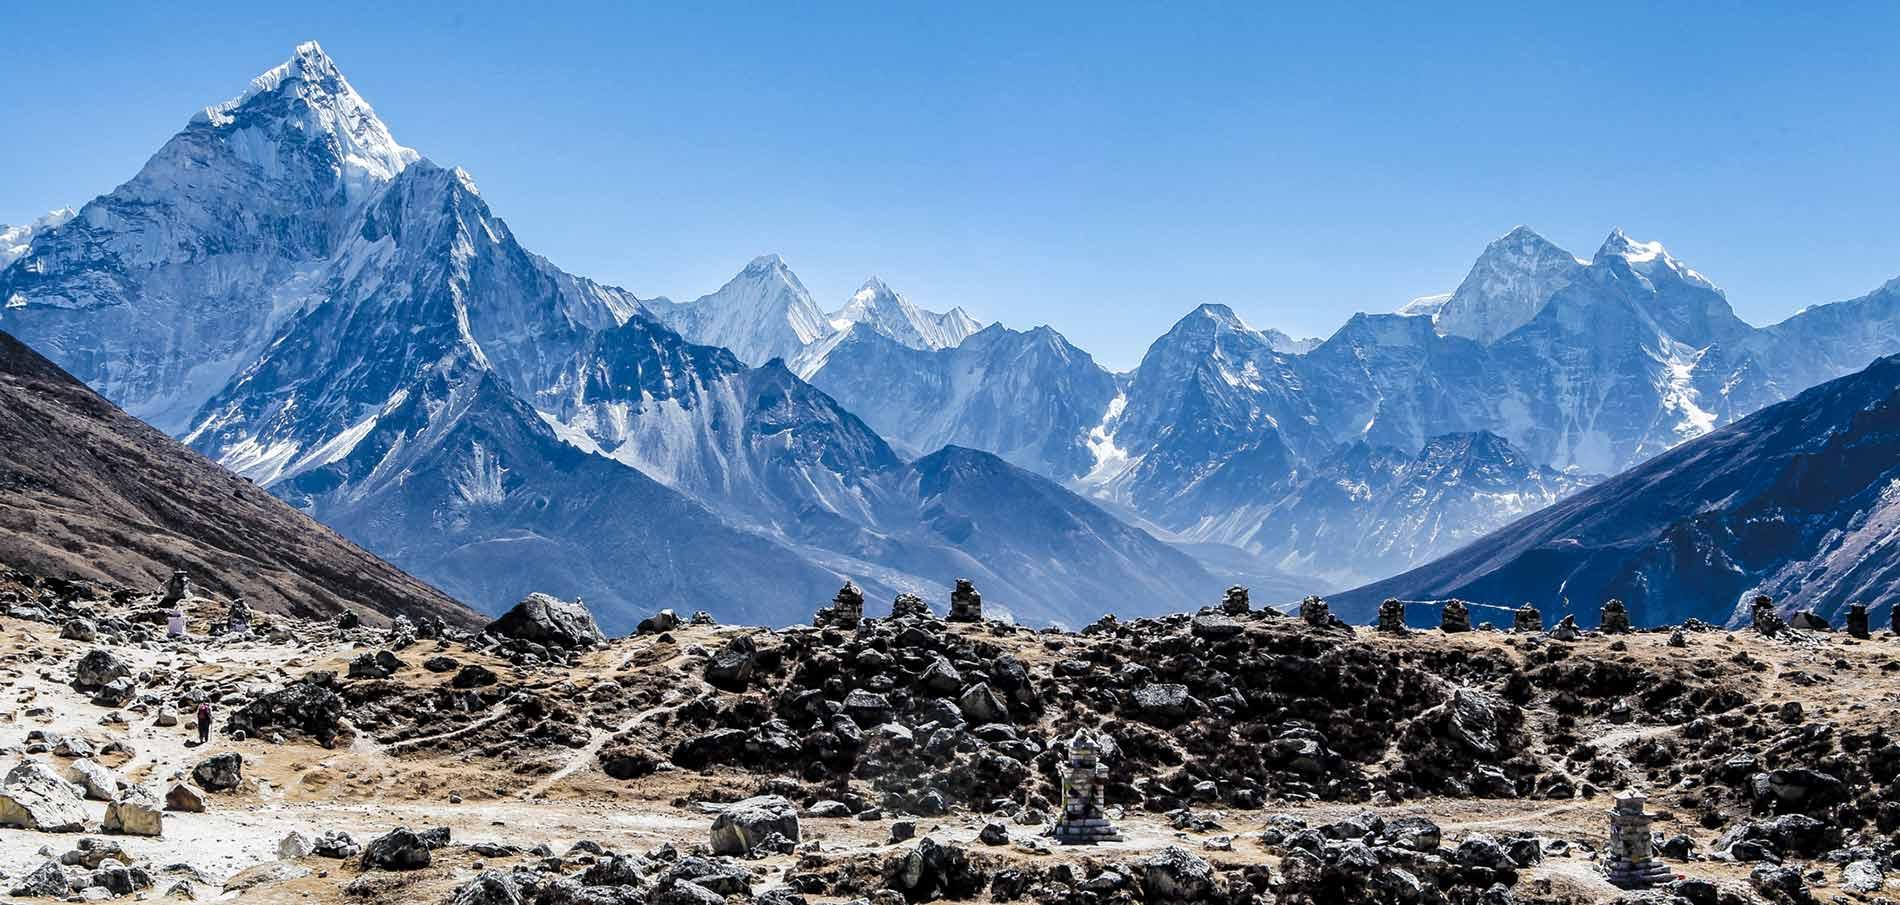 The Nepal Himalayas